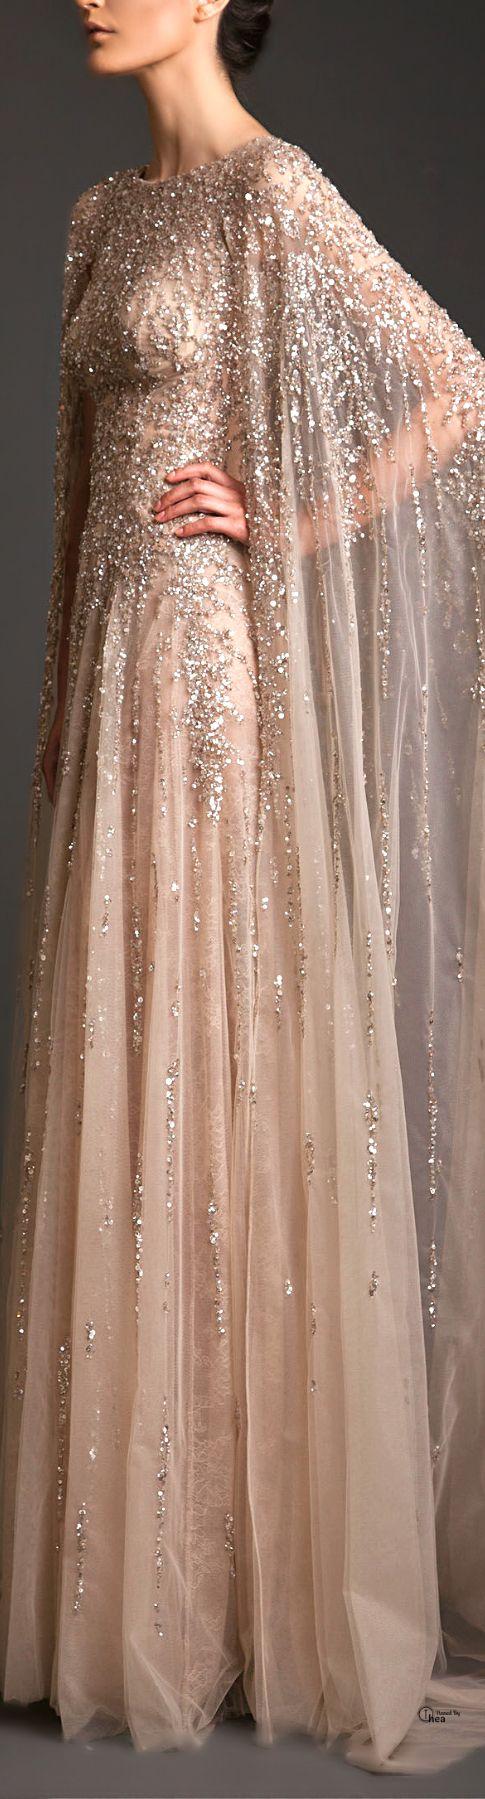 Krikor Jabotian ● Couture SS 2014 Queen amberly